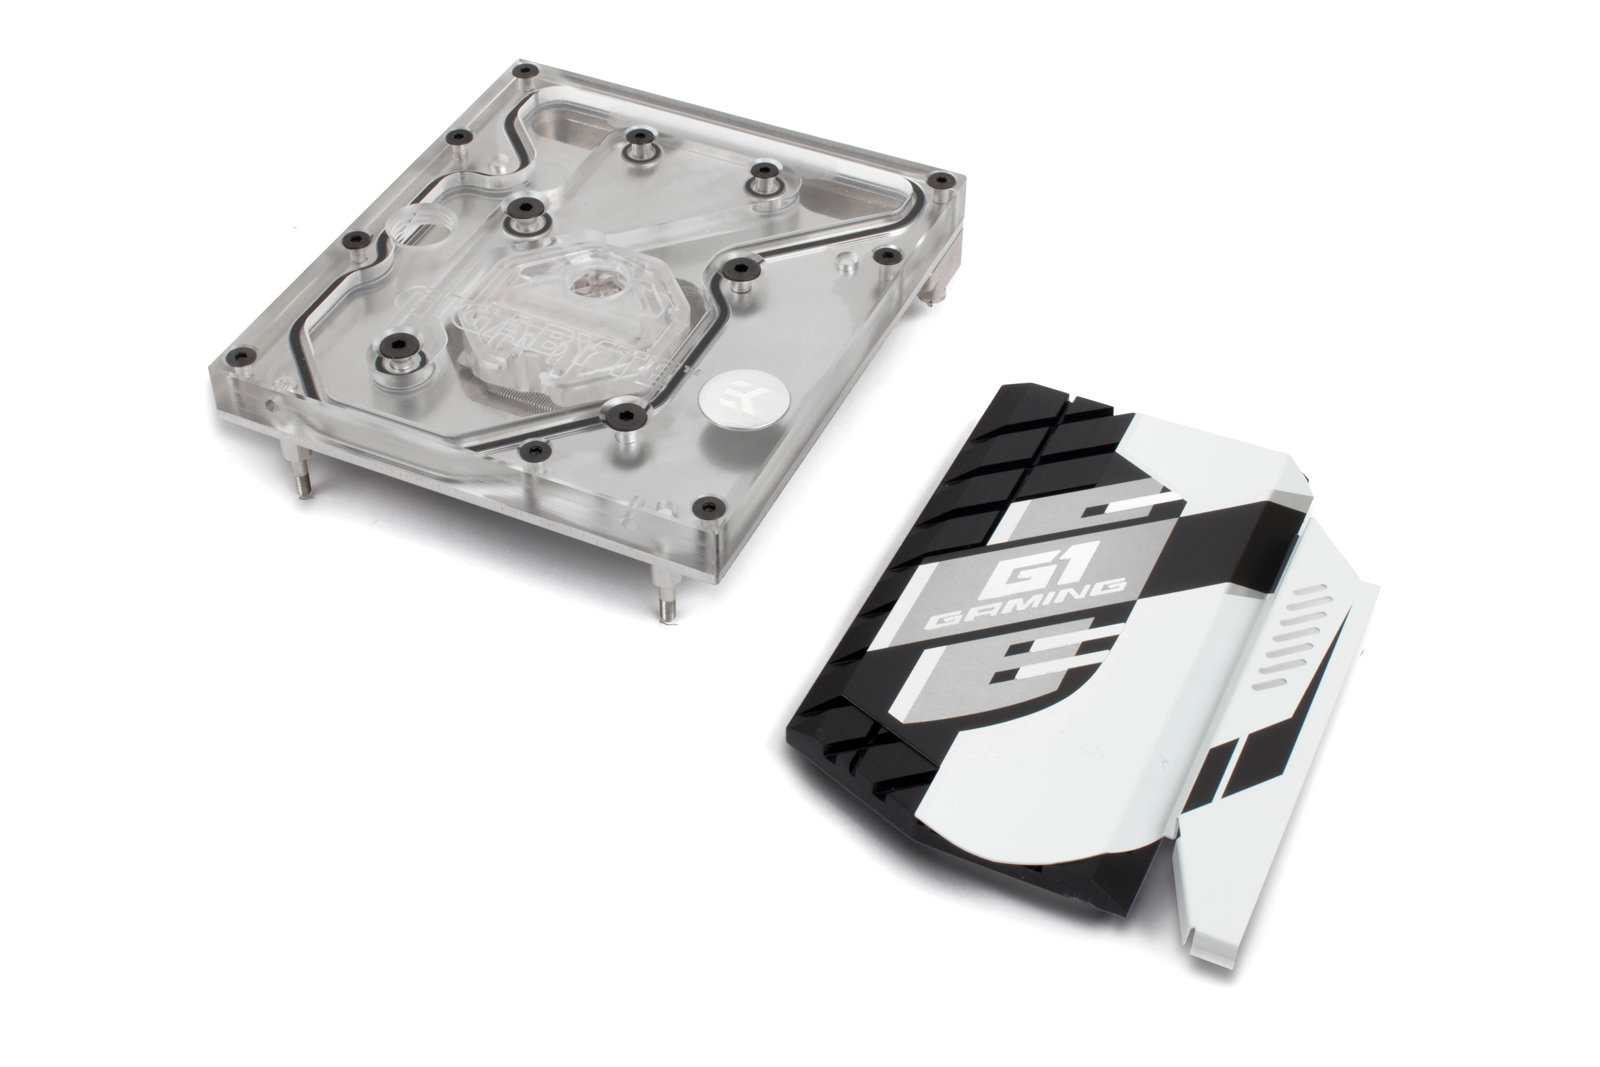 EK-FB GA X99 Ultra Monoblock – Nickel mit Chipsatz-Kühler